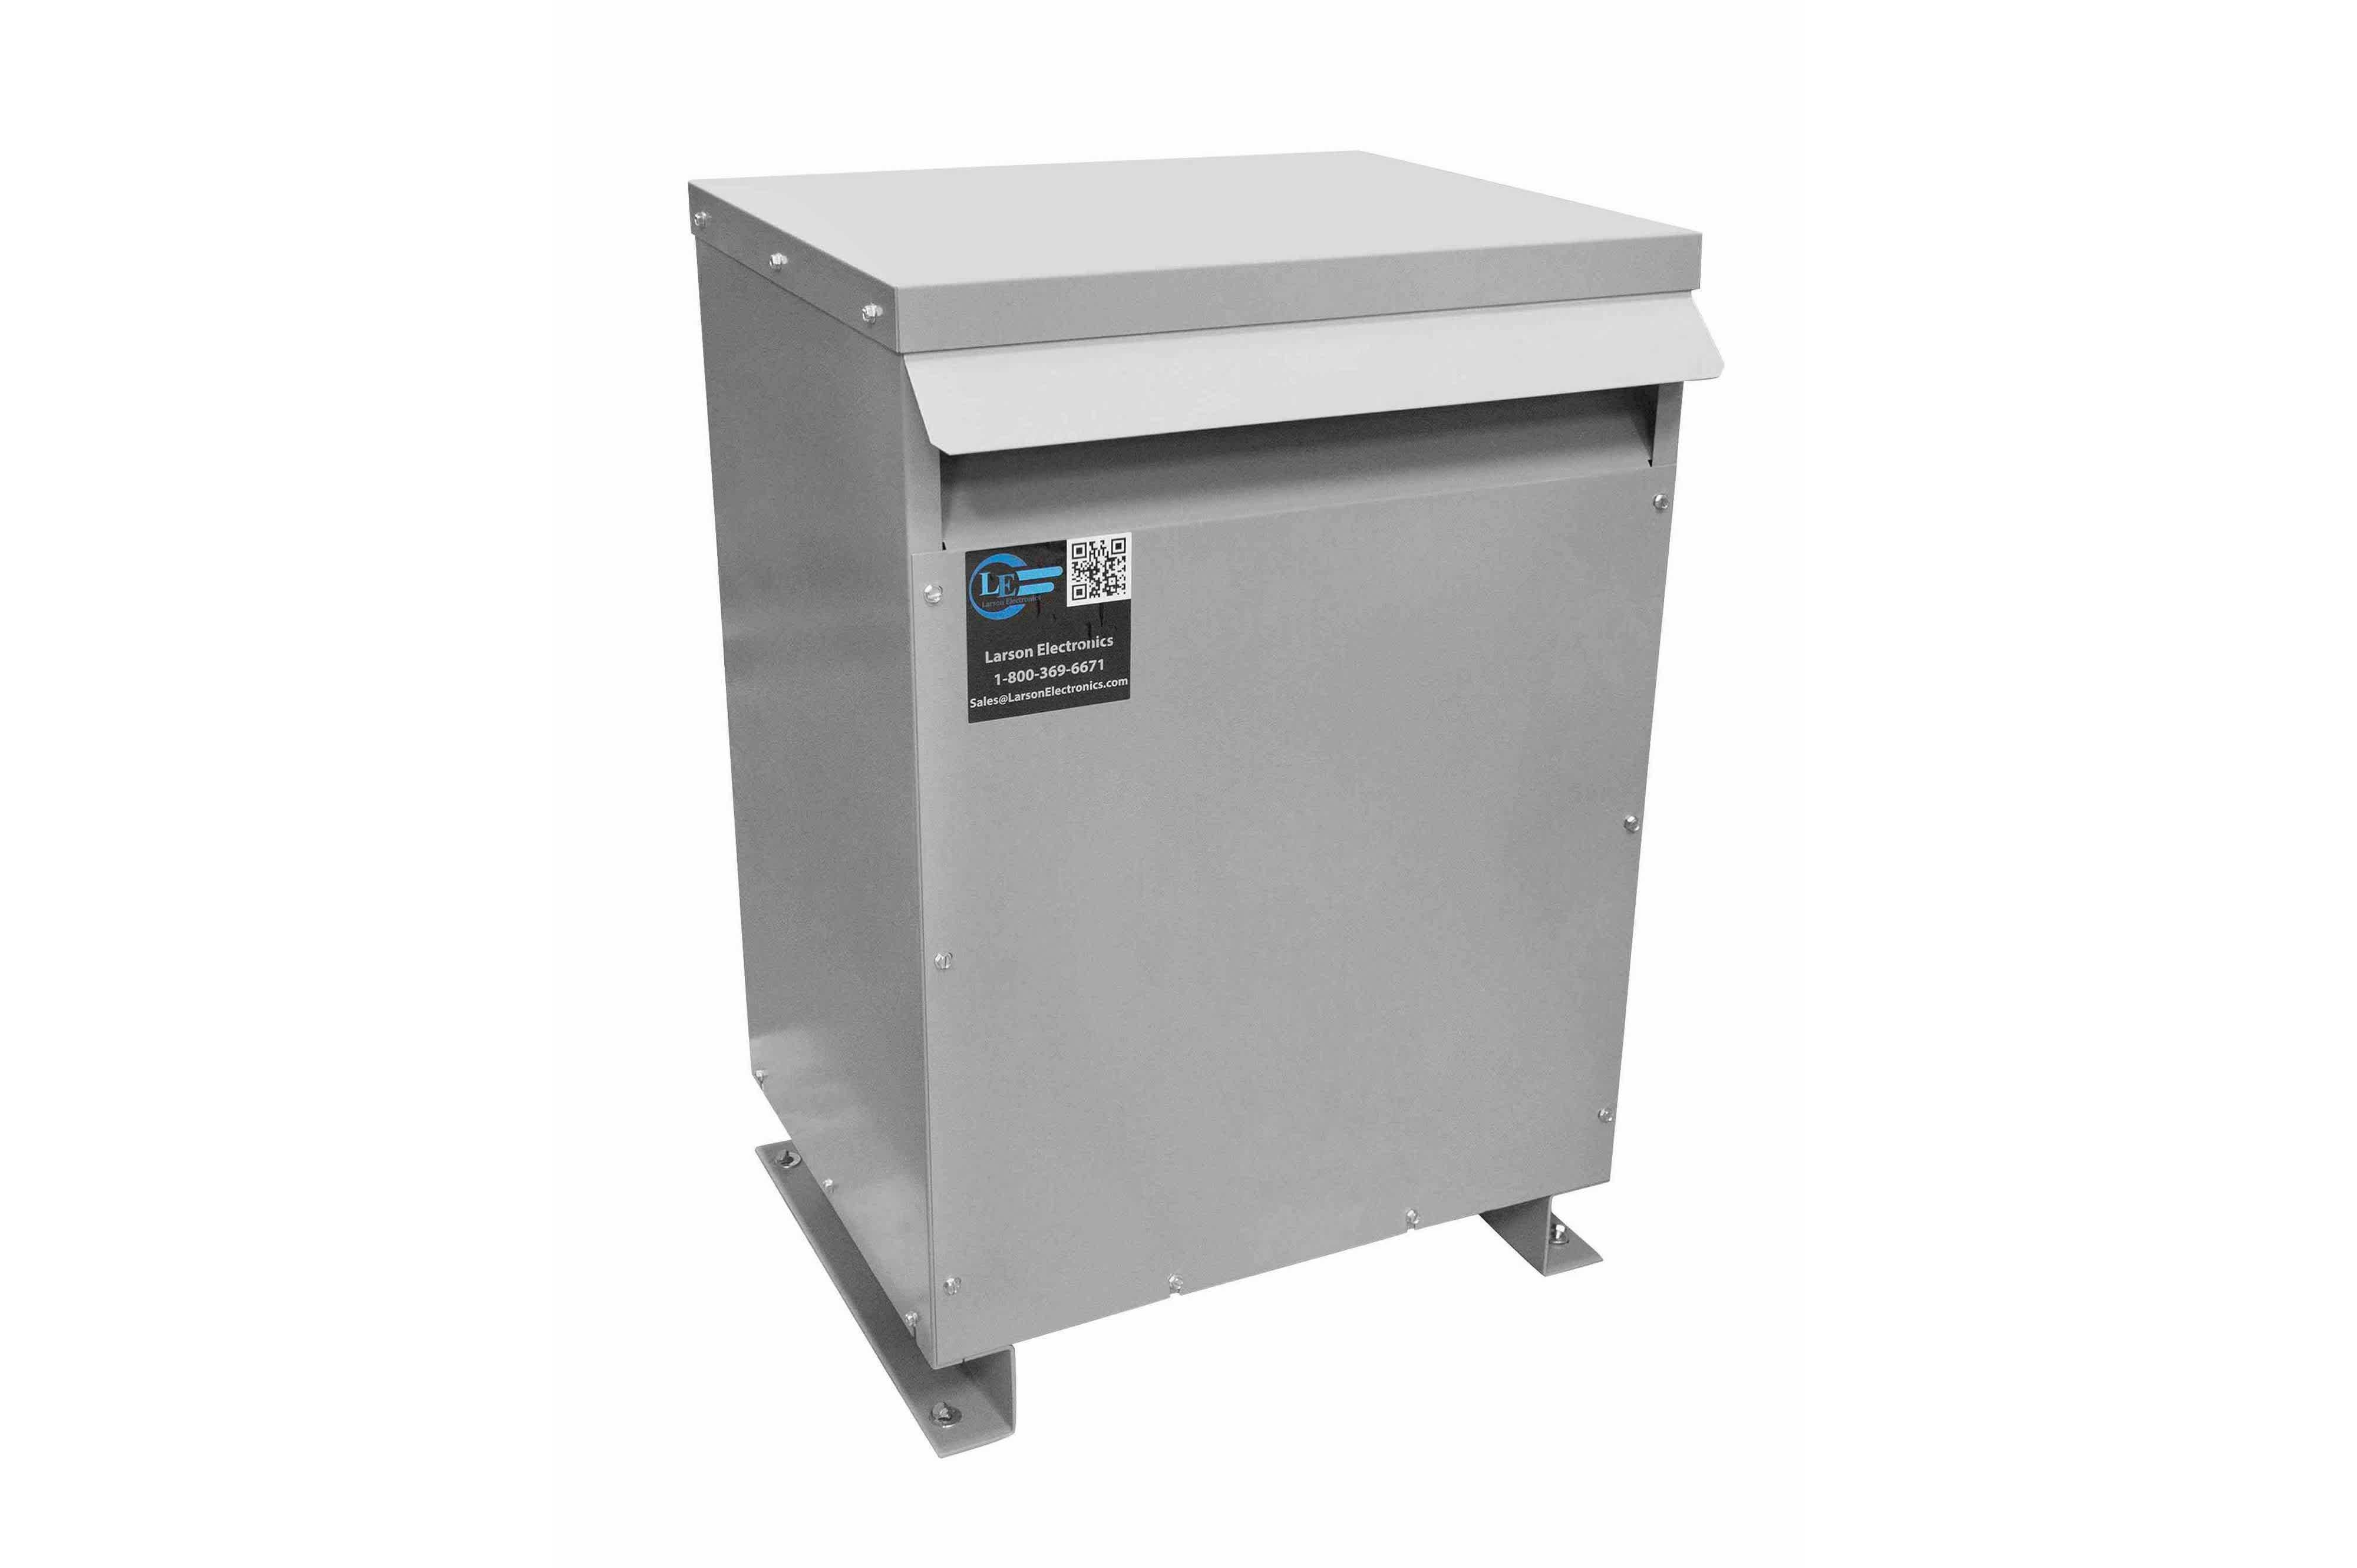 12 kVA 3PH Isolation Transformer, 240V Wye Primary, 600V Delta Secondary, N3R, Ventilated, 60 Hz